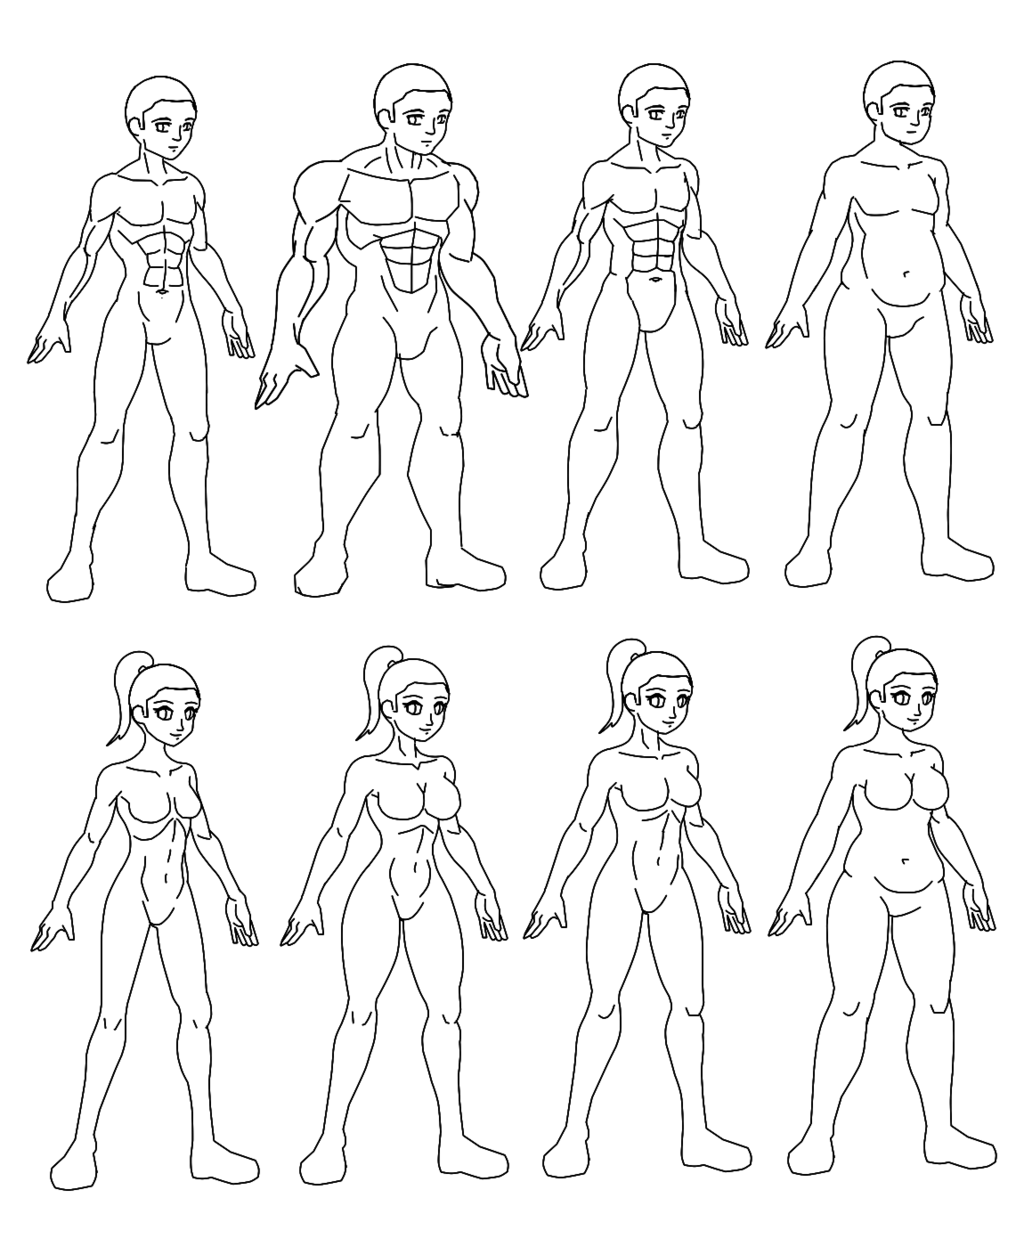 1024x1247 Body Types (Lineart) By Dyz 69